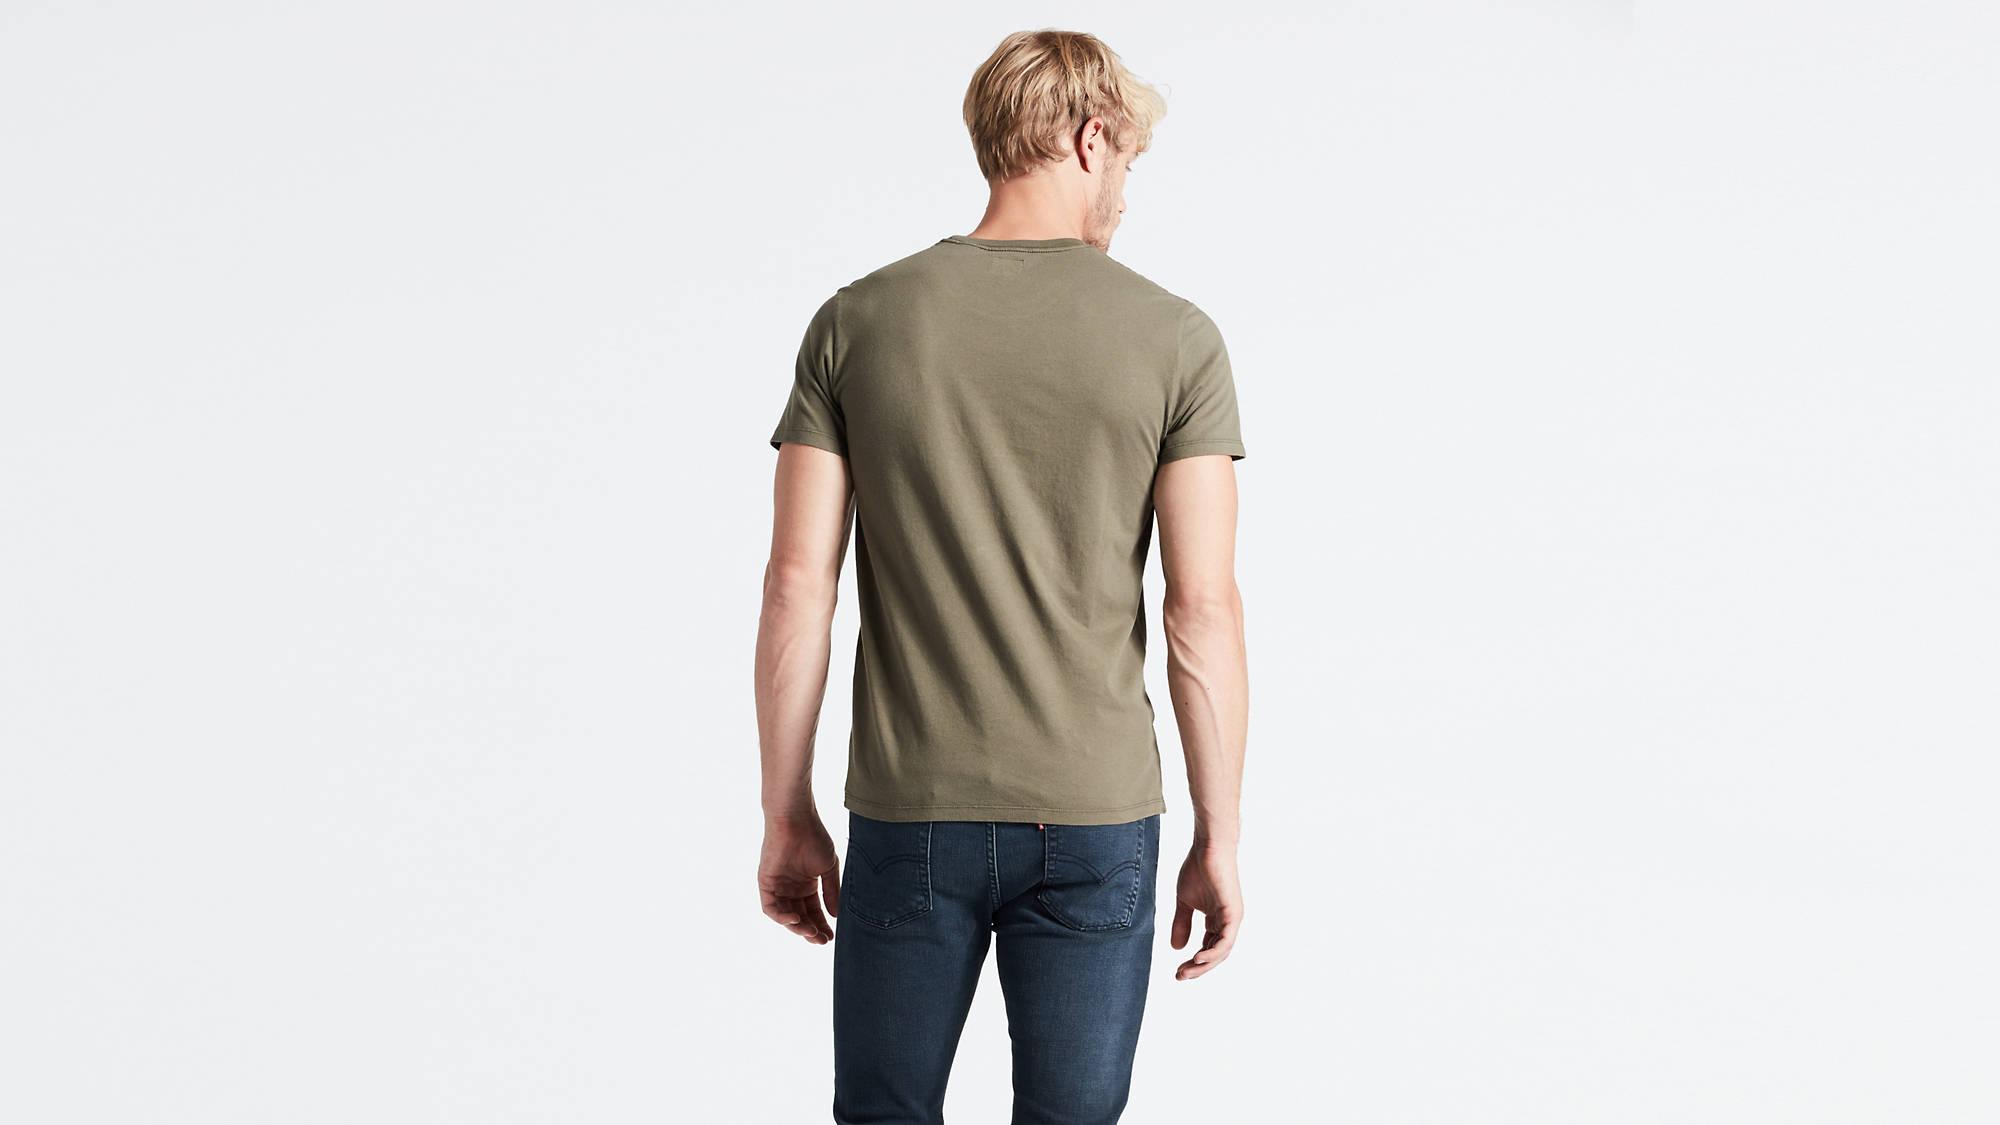 Levi's Original t-shirt, green, small